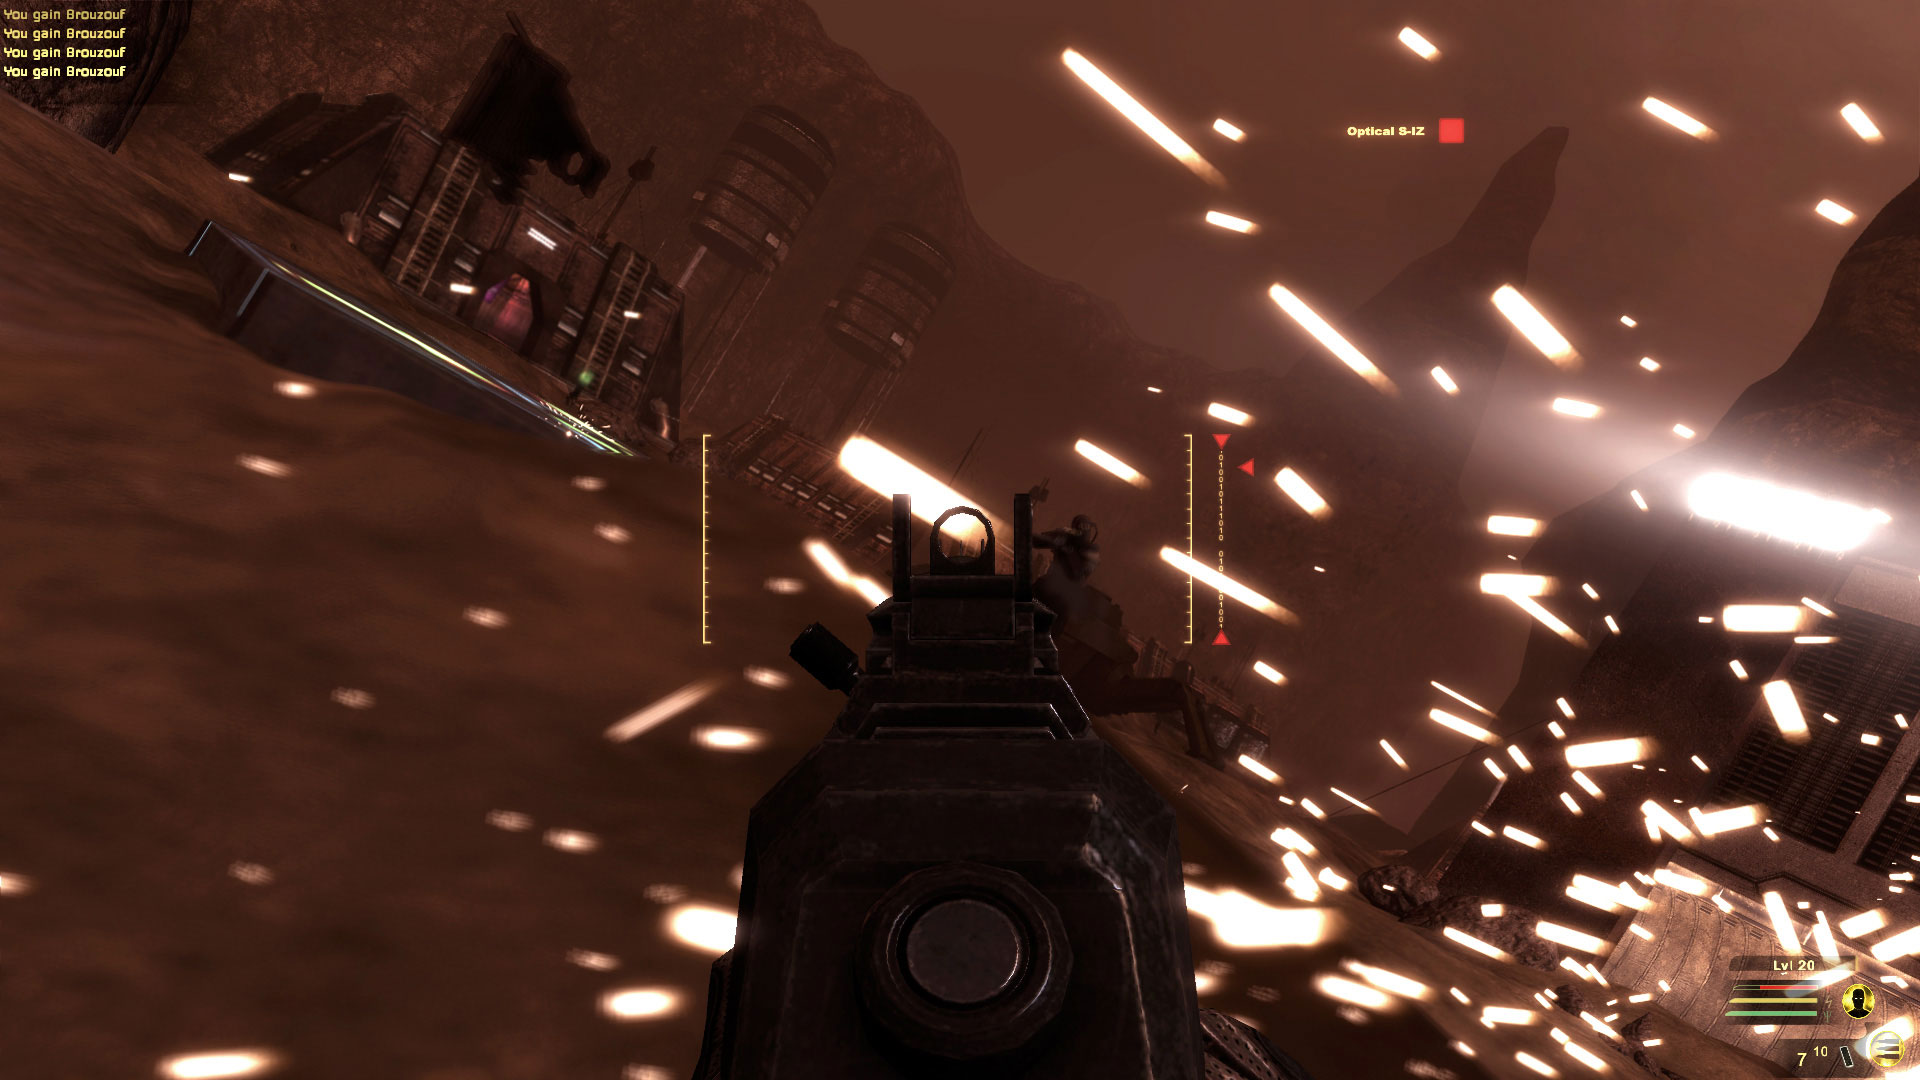 Divine Cybermancy на сайте Games.mail.b ru /b- Игры@Mail.b Ru/b.